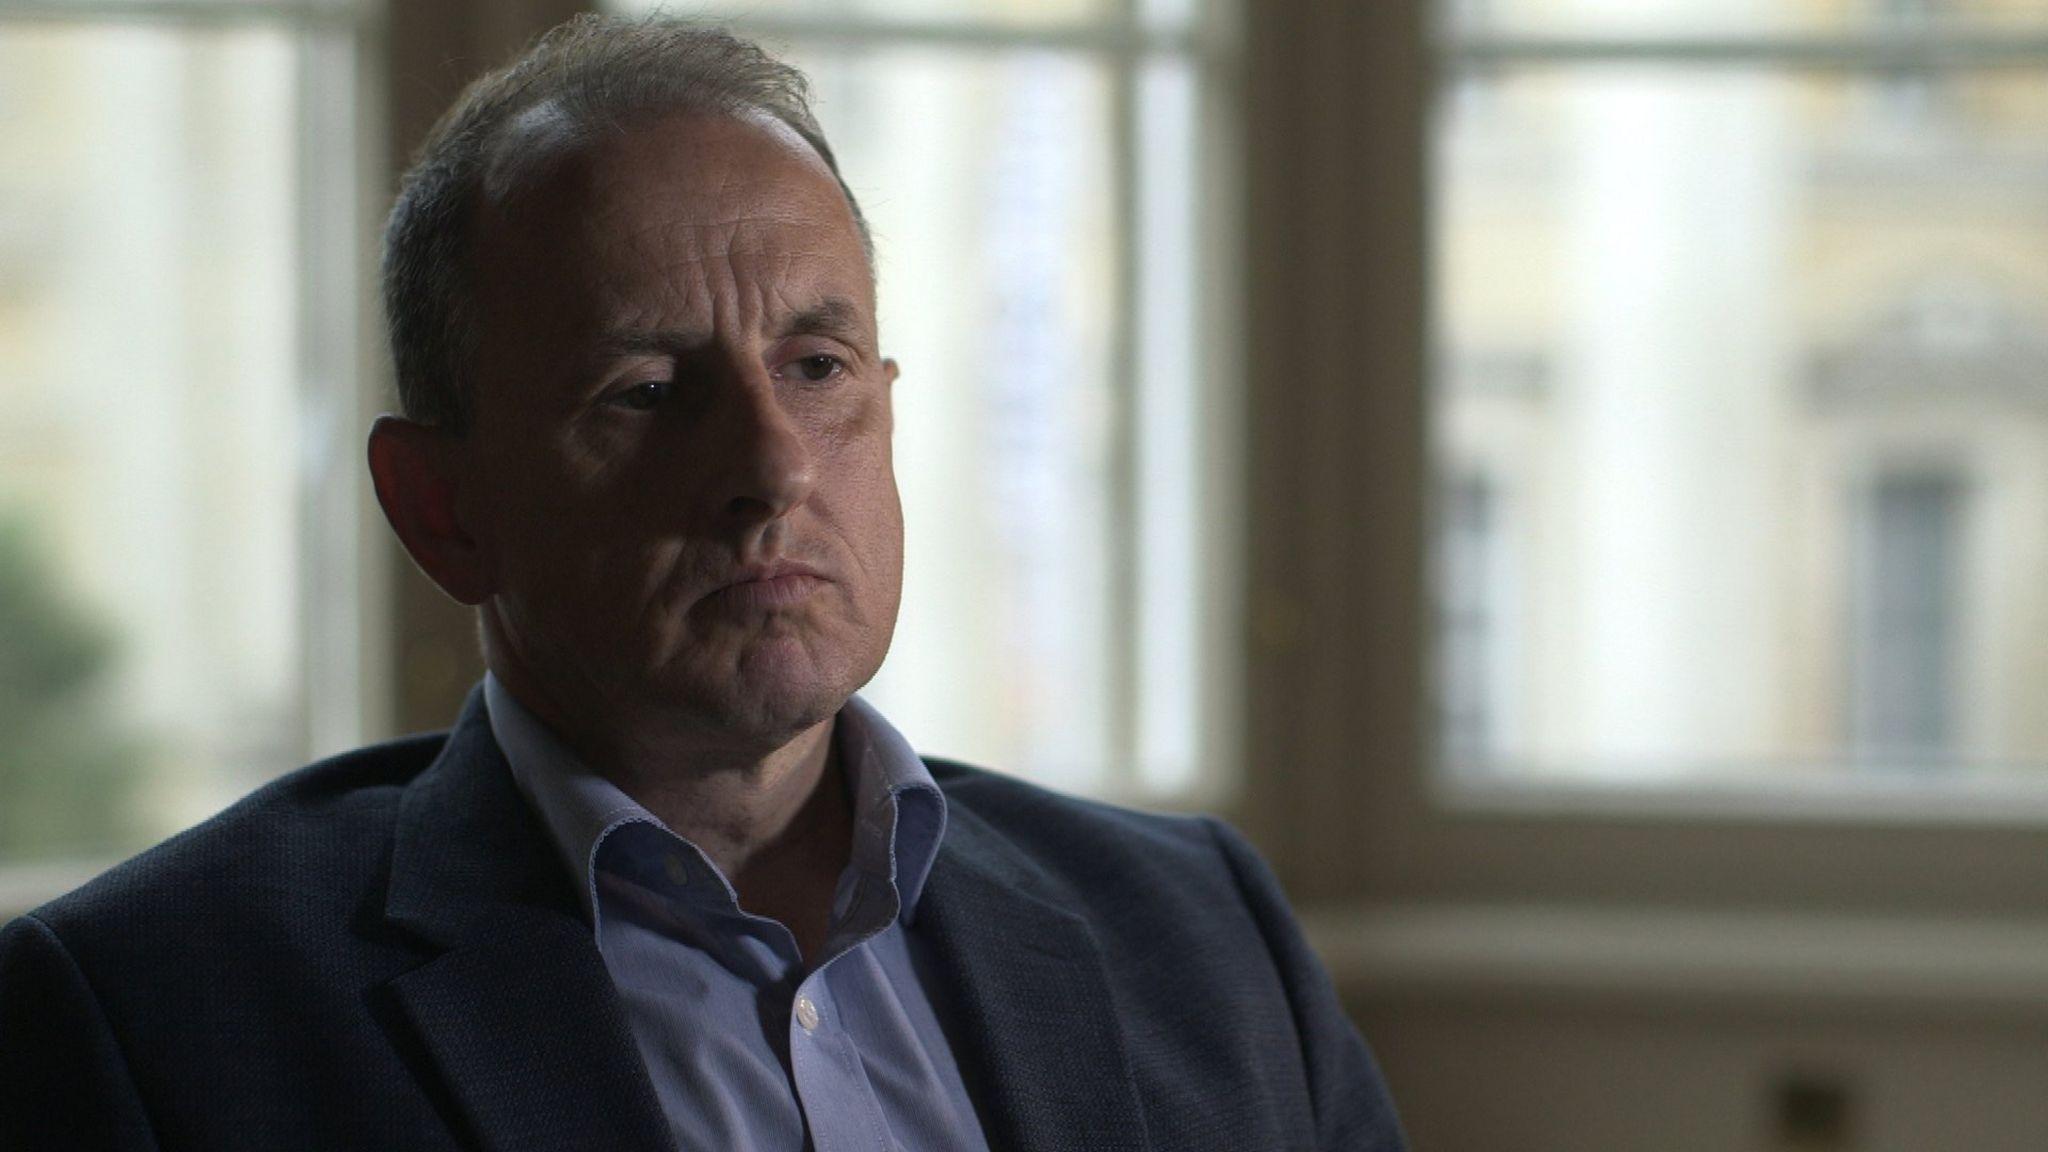 Frank Ledwidge being interviewed by BBC Panorama